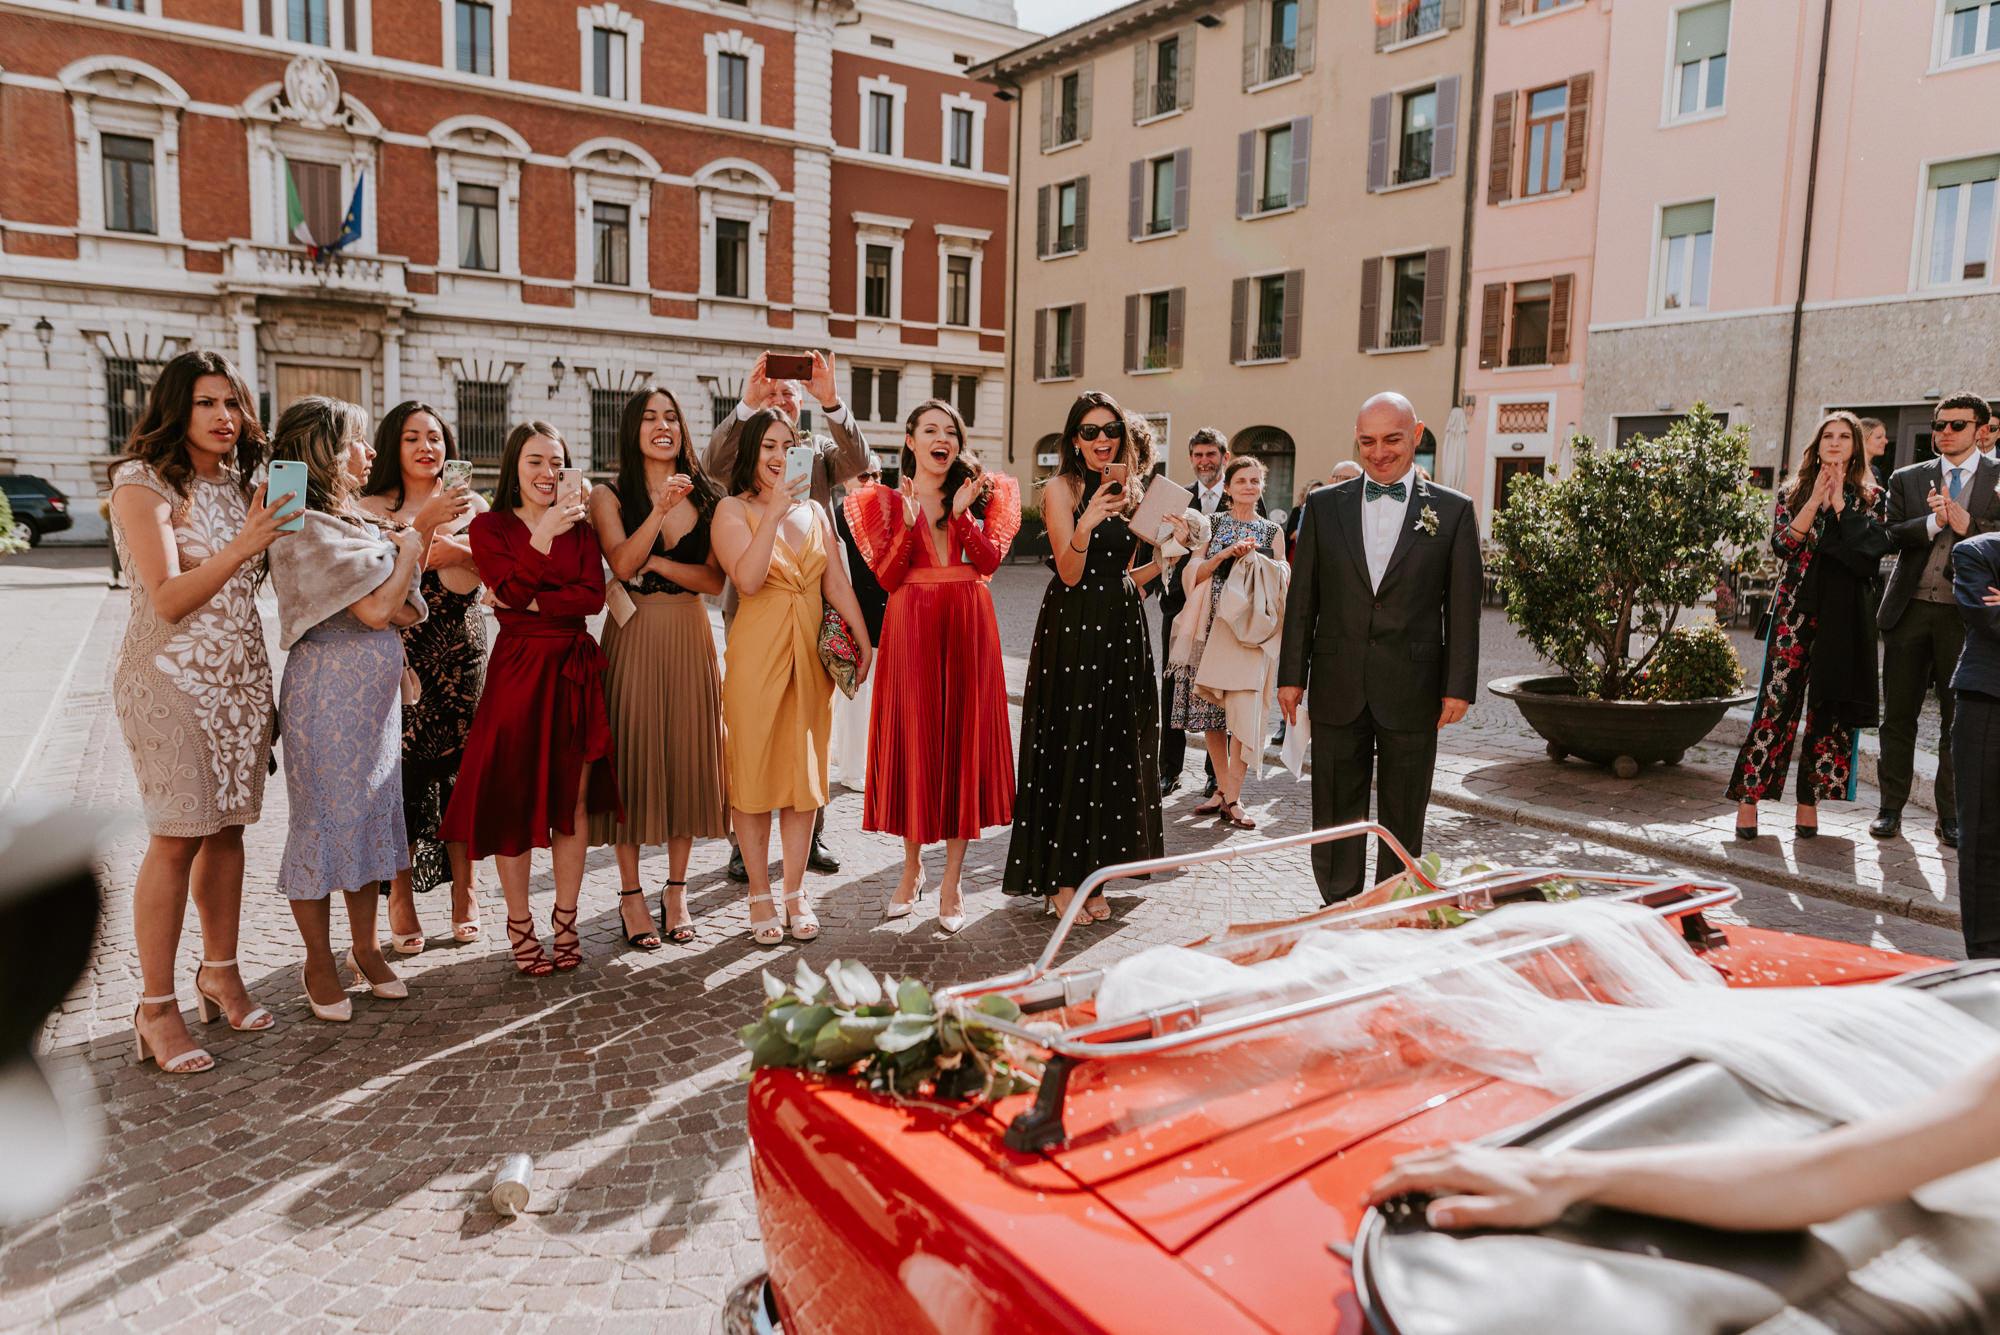 FOTO+PHOTO+BODA+WEDDING+ITALIA+ITALY+MAURICIO+GARAY+MAURICIOGARAY+WEDDINPHOTOGRAPHER+FOTOGRAFODEBODA-1131.jpg